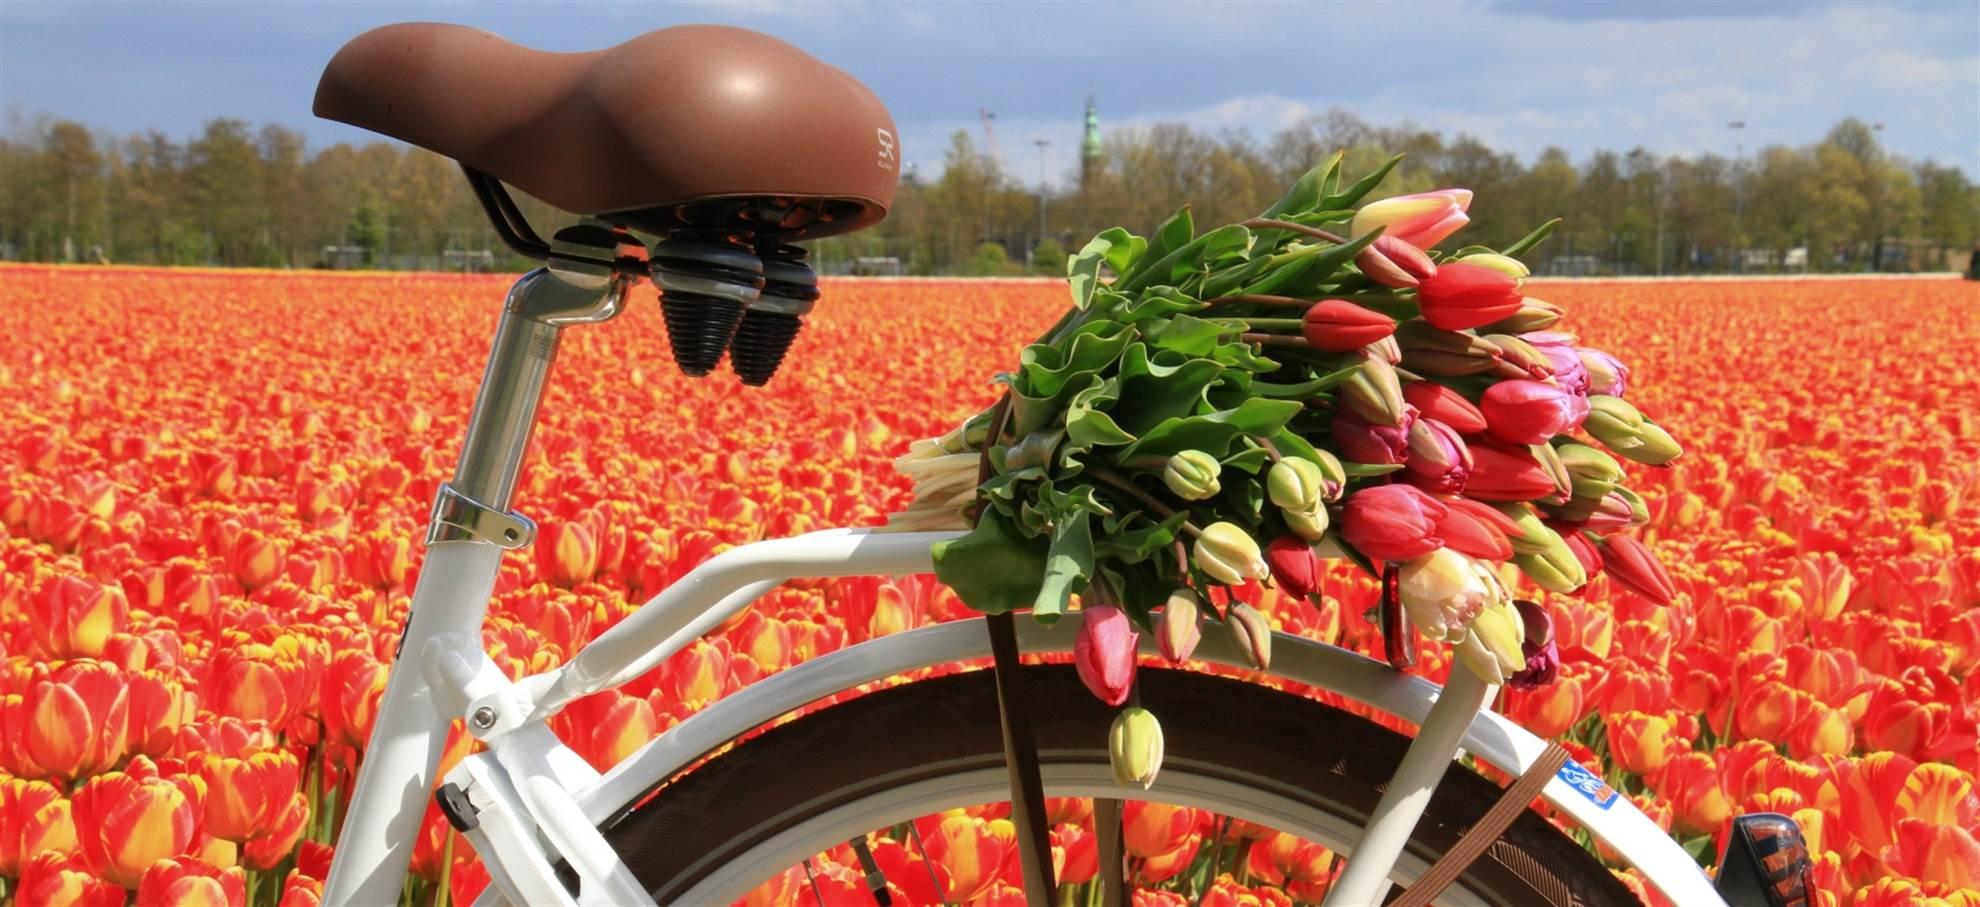 Lisse (Keukenhof) Fahrradverleih + Flowerfield Audioguide